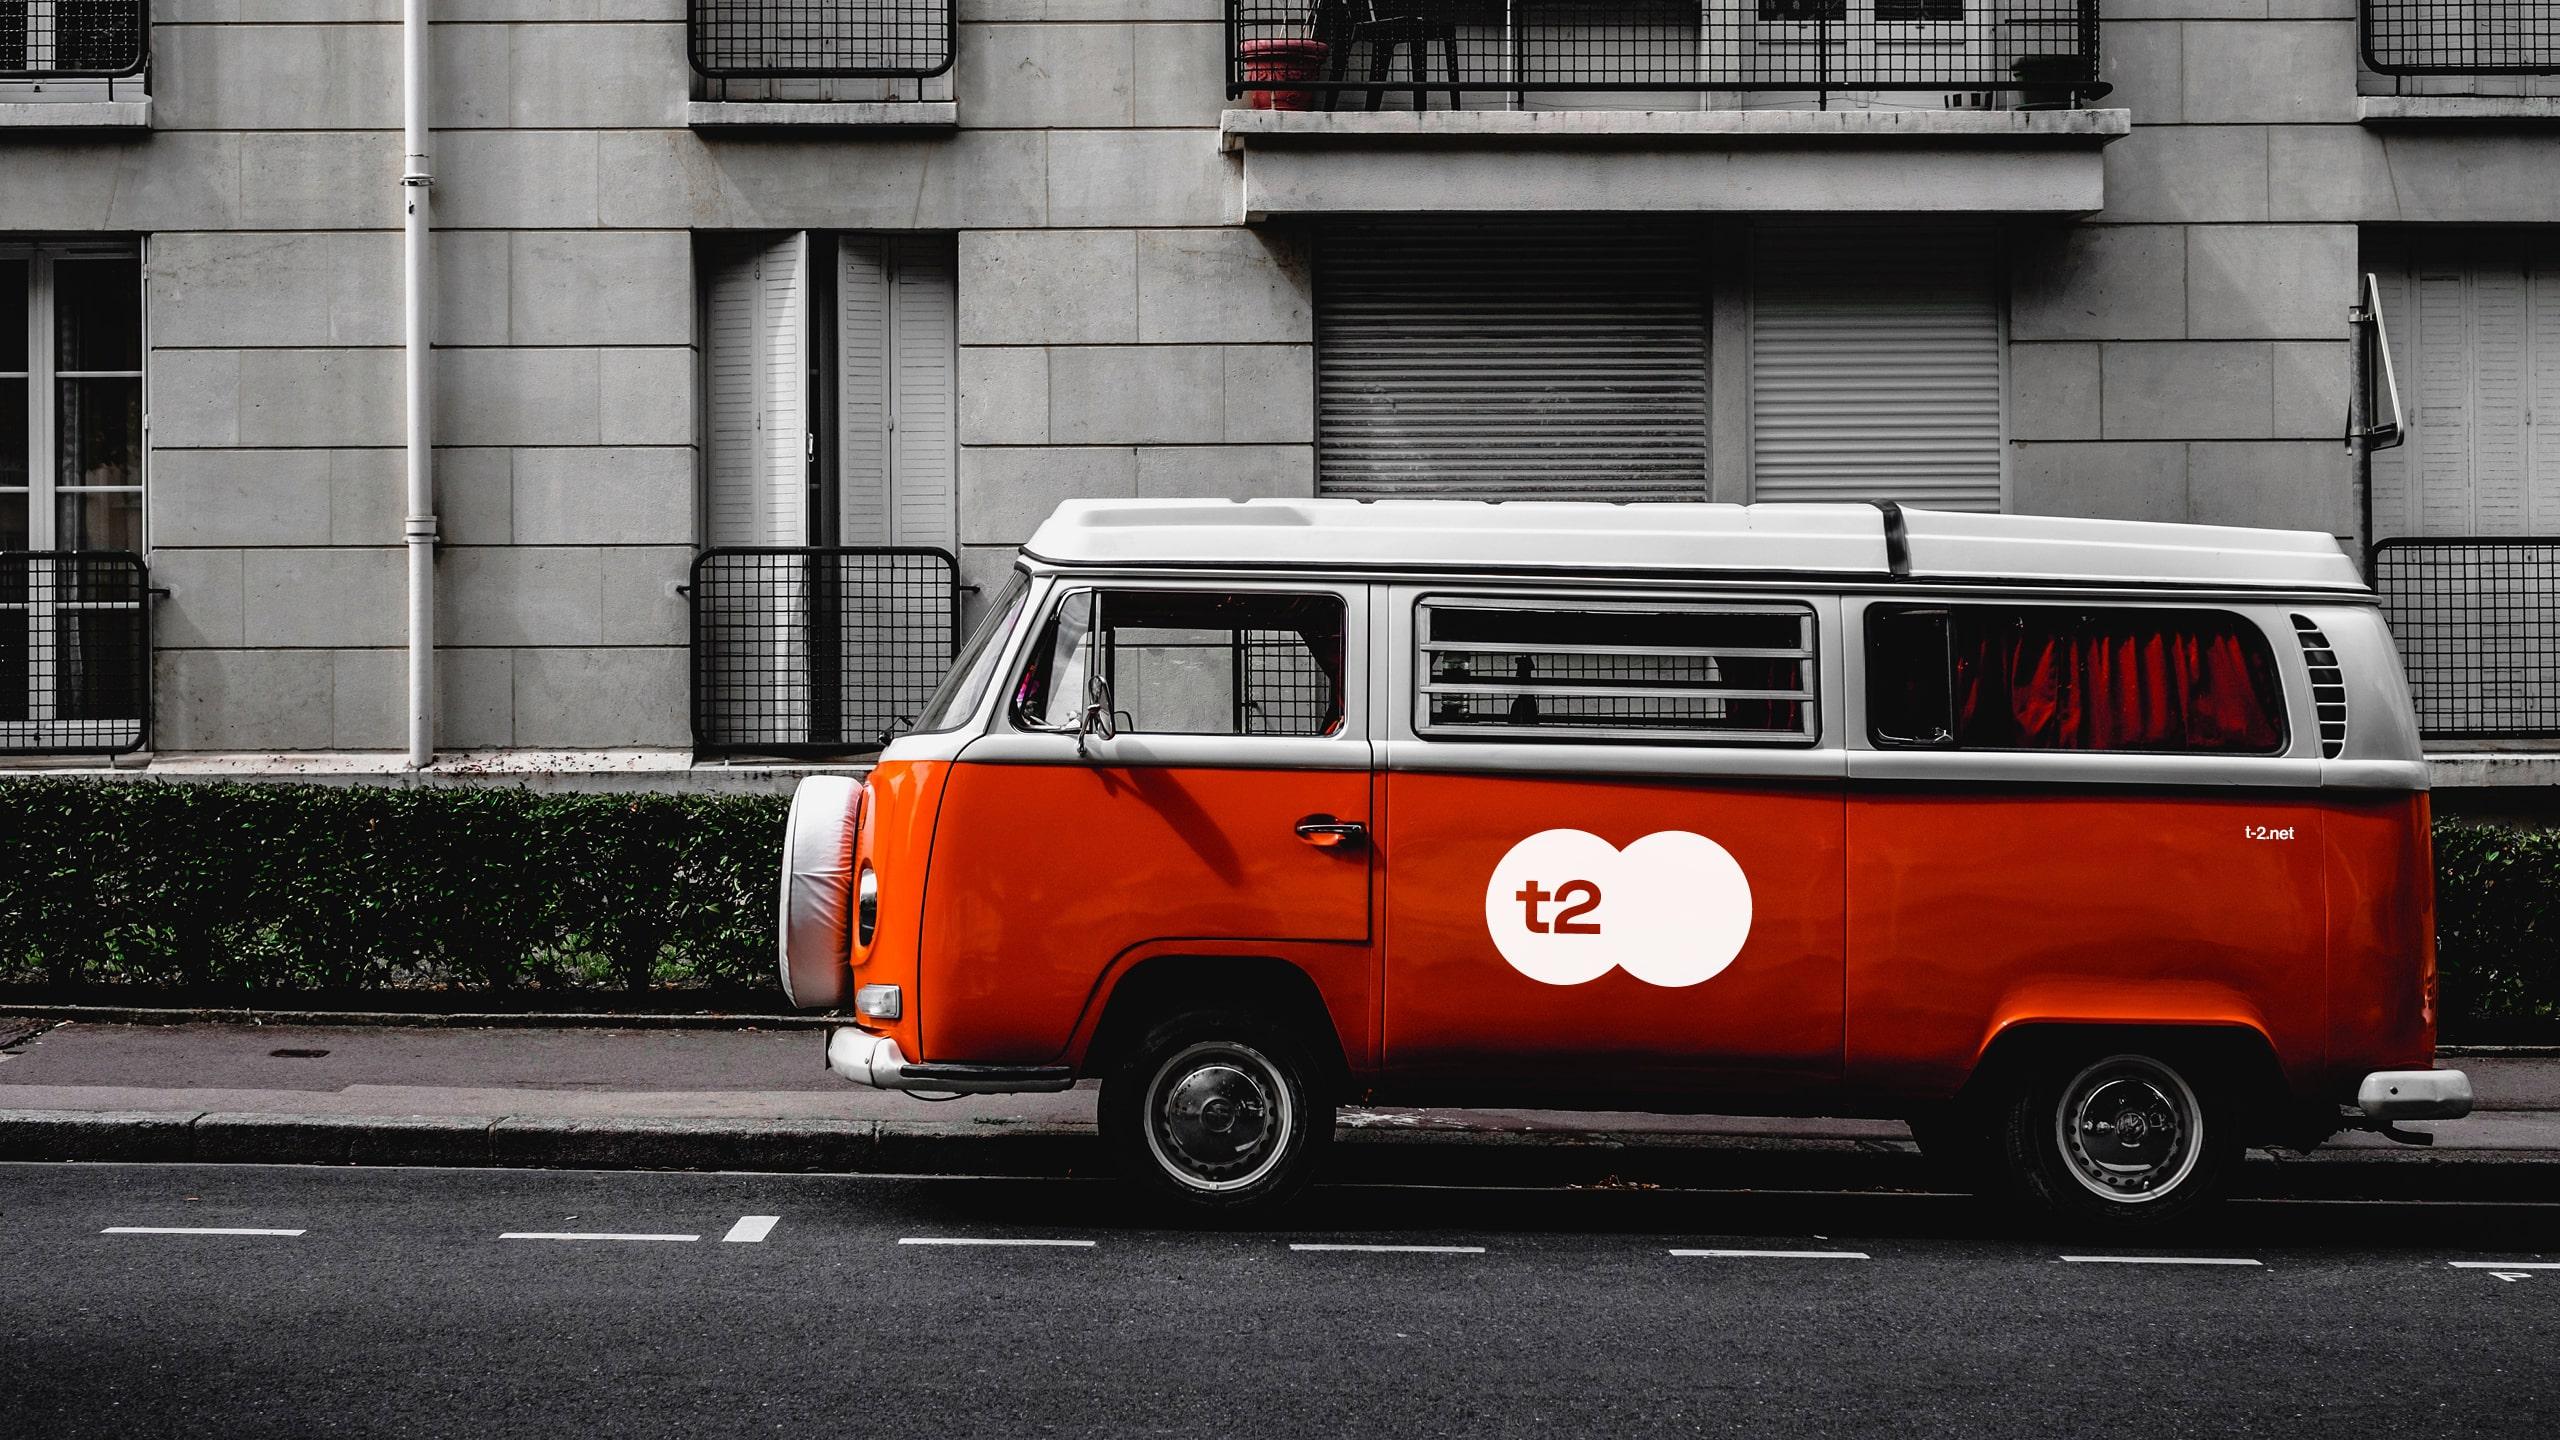 mantik-digital-branding-development-agency-creative-app-ui-web-branding-26-min